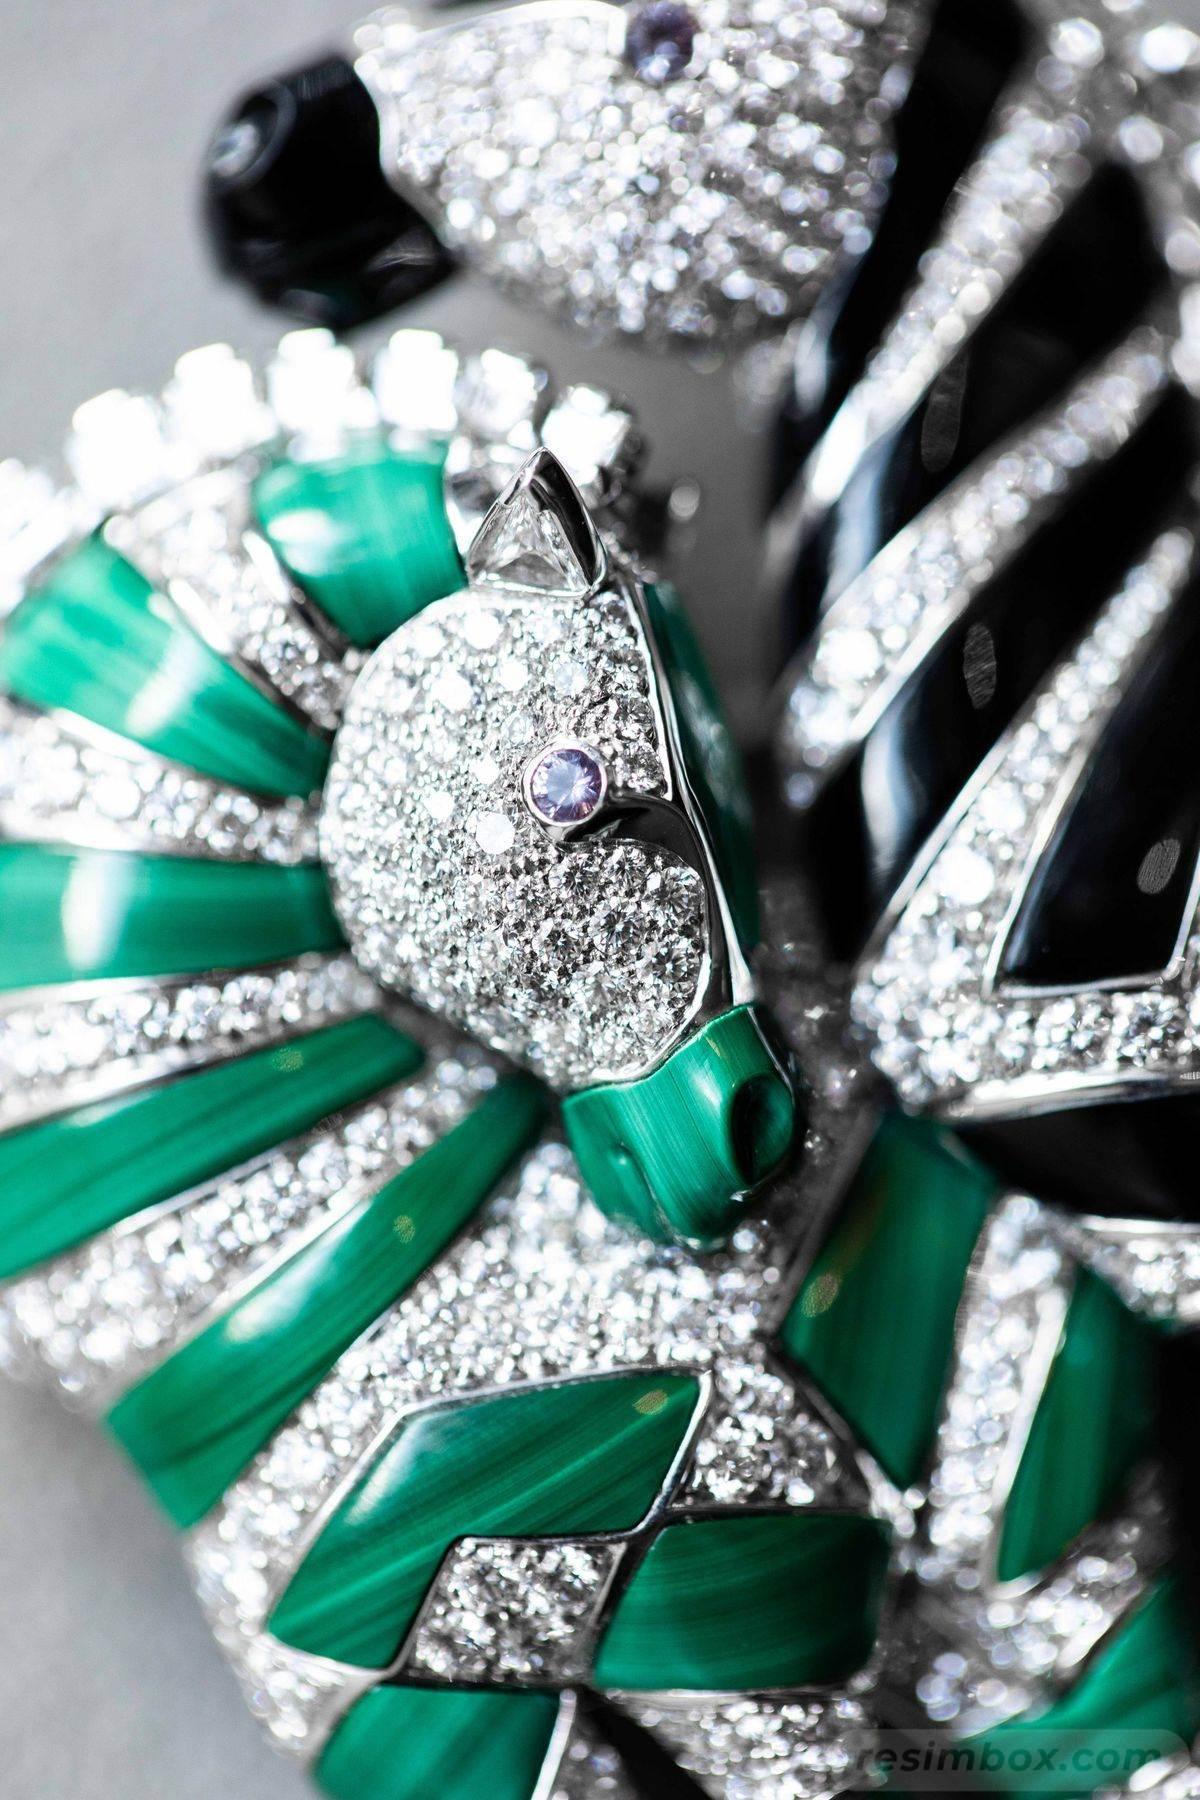 gemologue-animal-jewelry-curation-141652350767582434